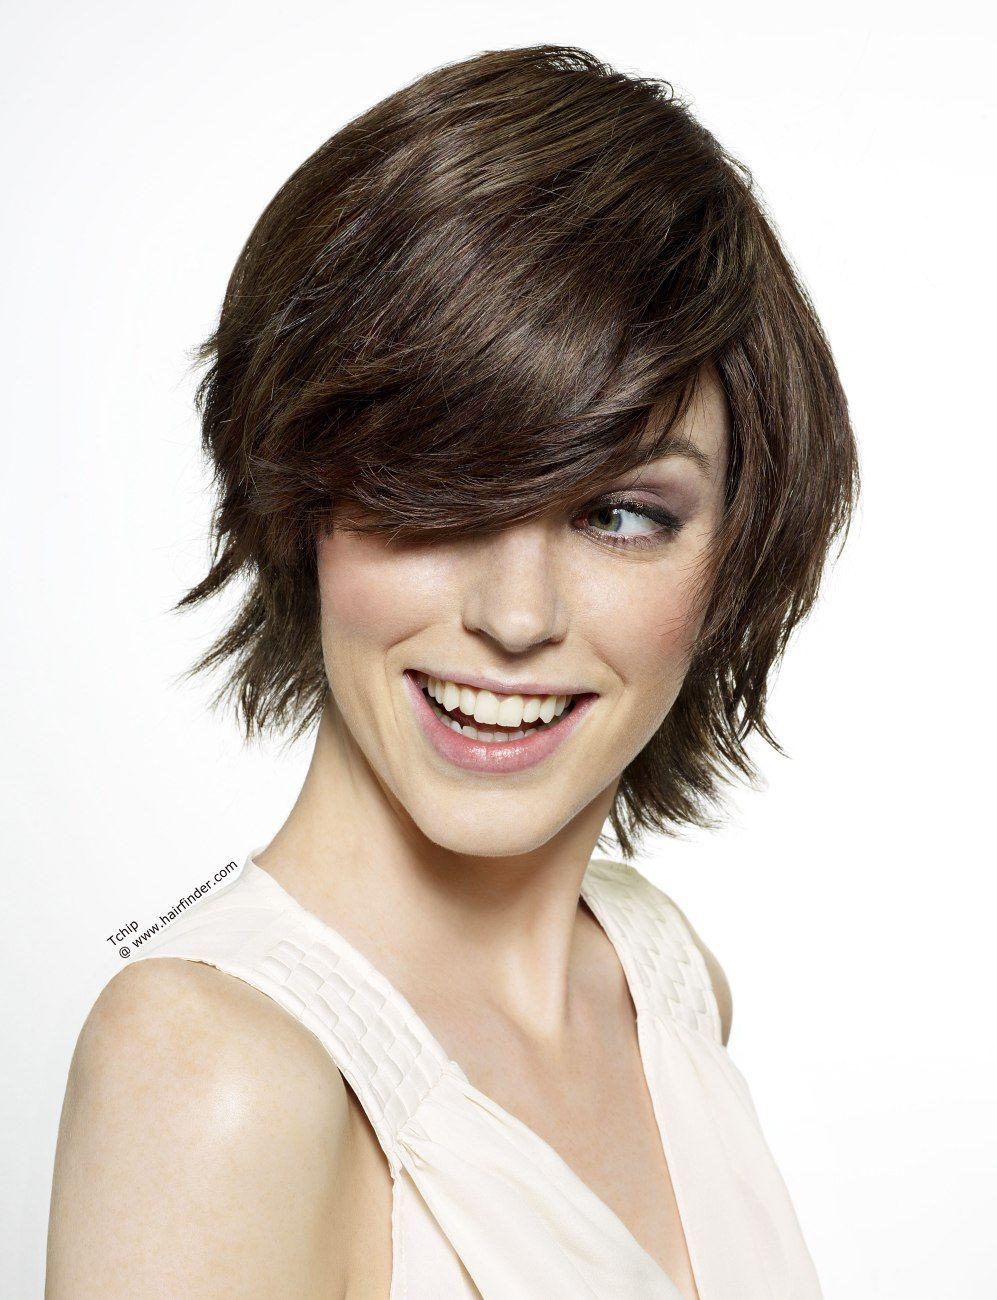 Short layered hairstyle youfititshorthairstyles